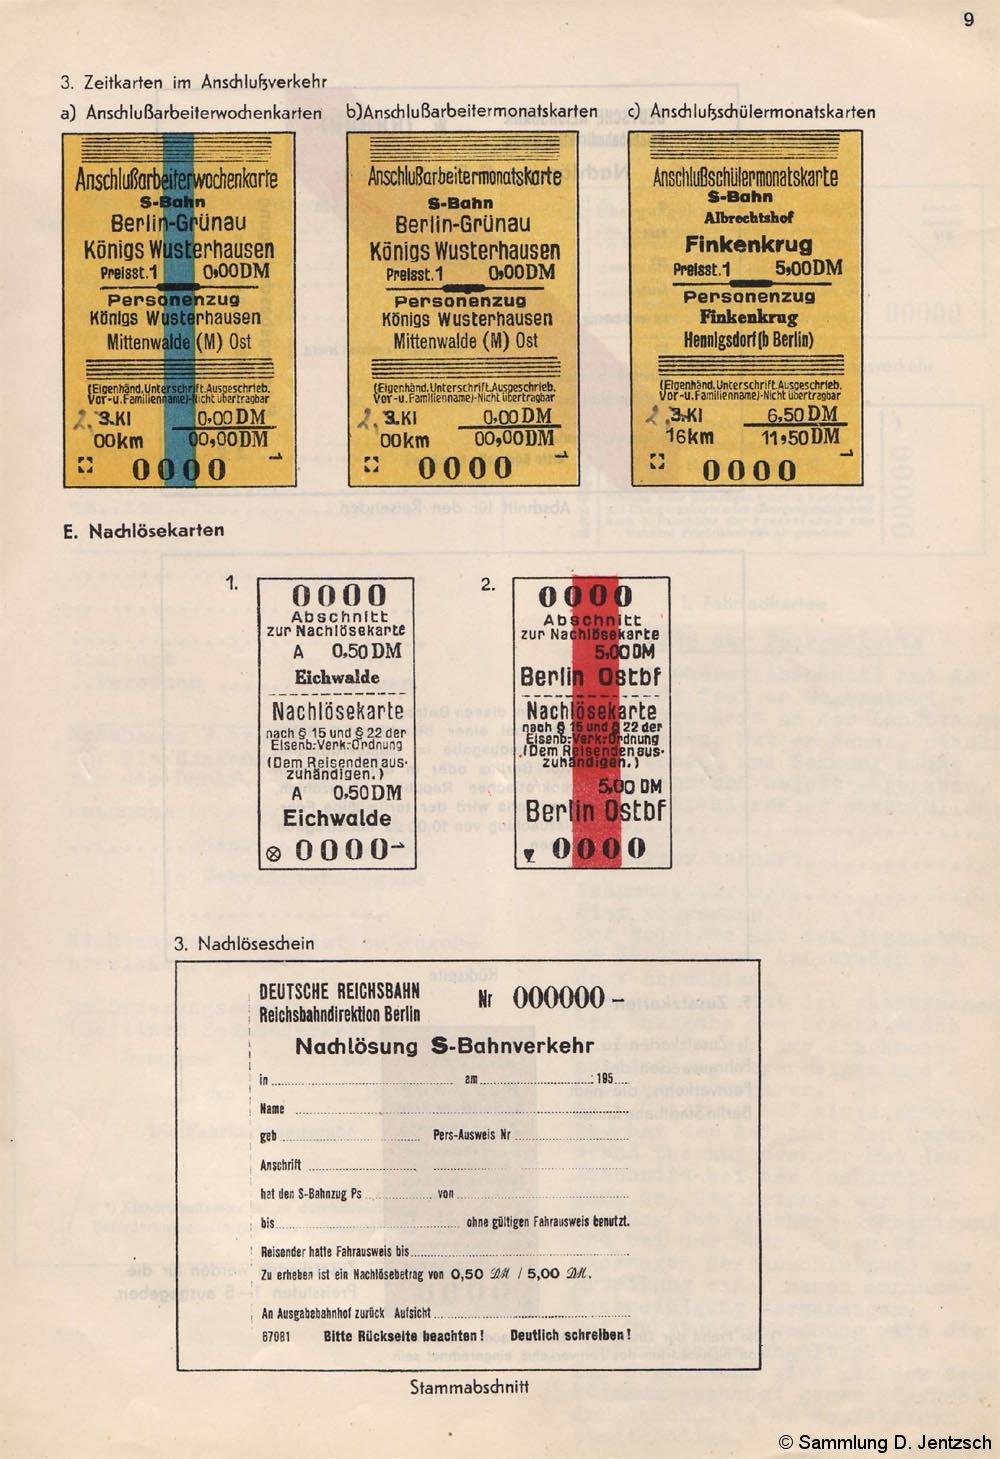 Bild: Muster Seite 9